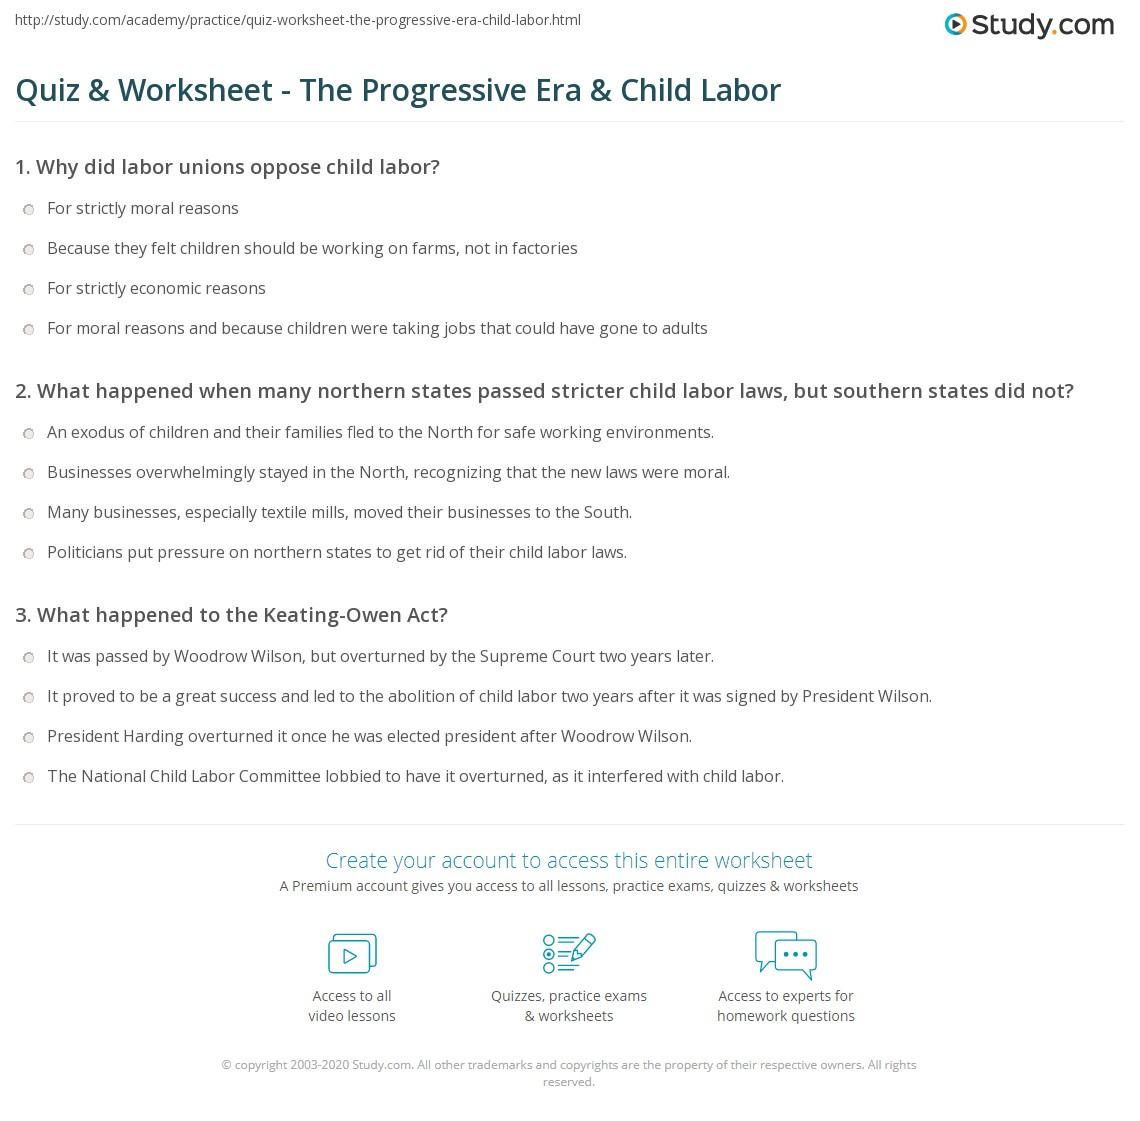 Print Child Labor in the Progressive Era Worksheet